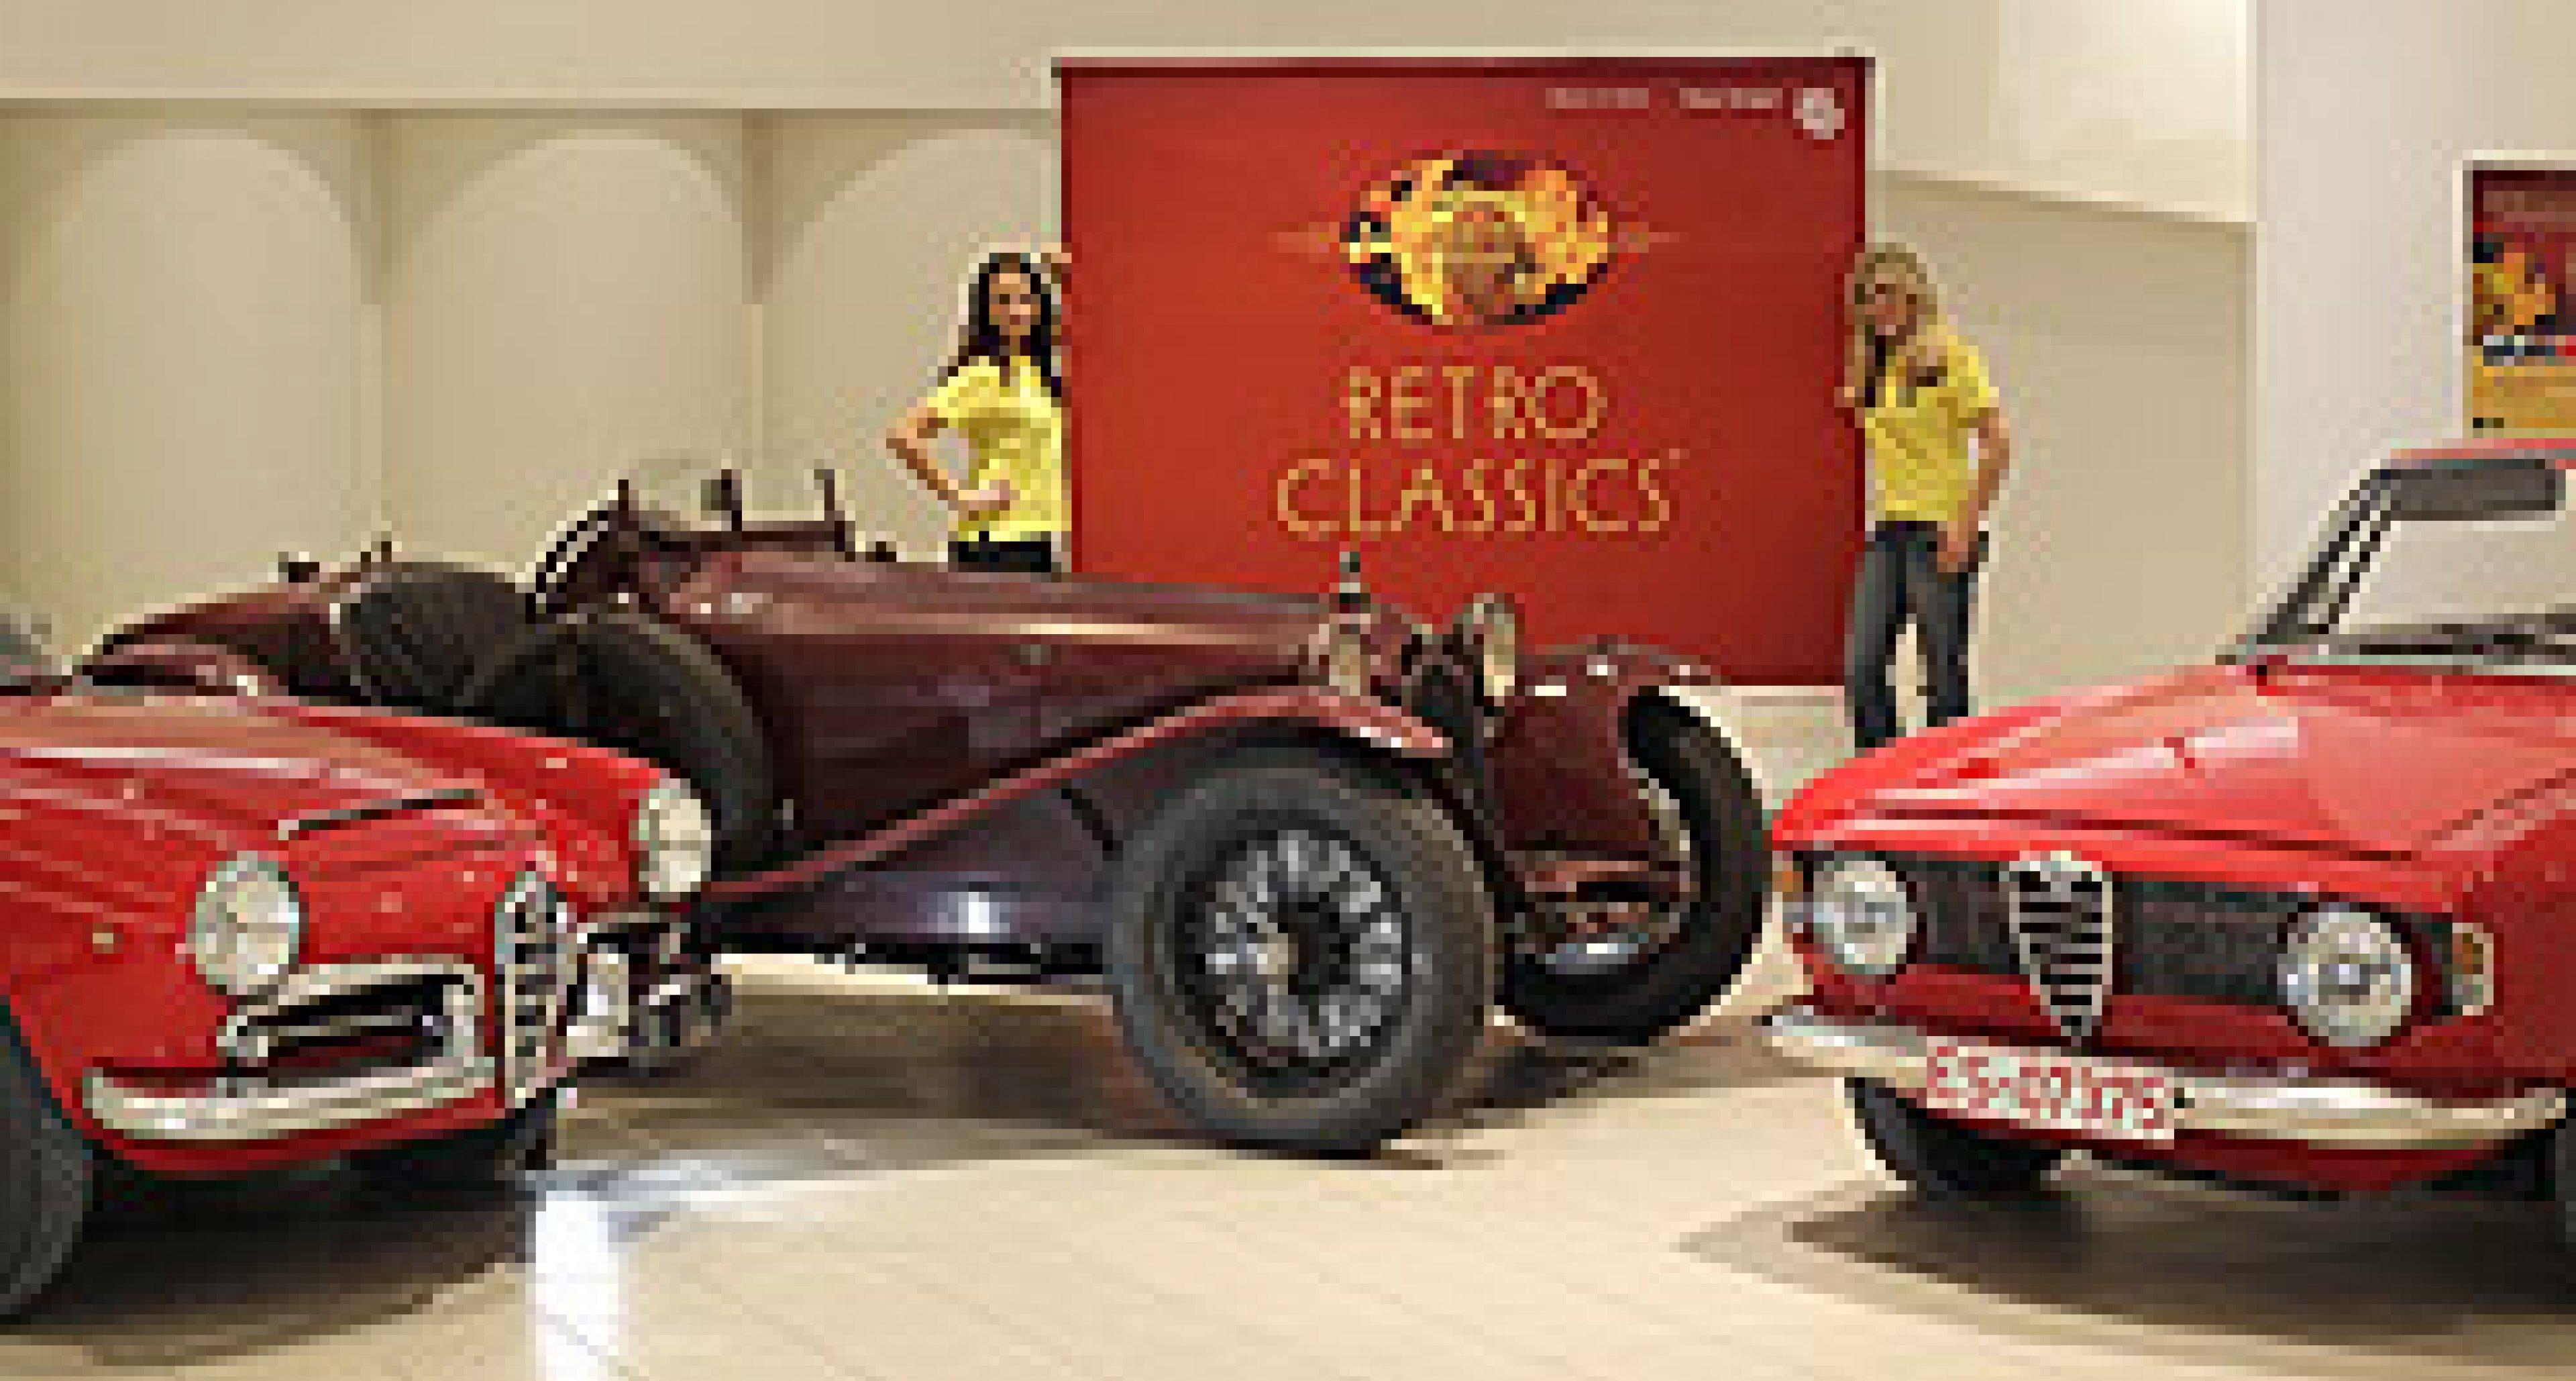 Retro Classics 2010: Jubiläum zum Jubiläum